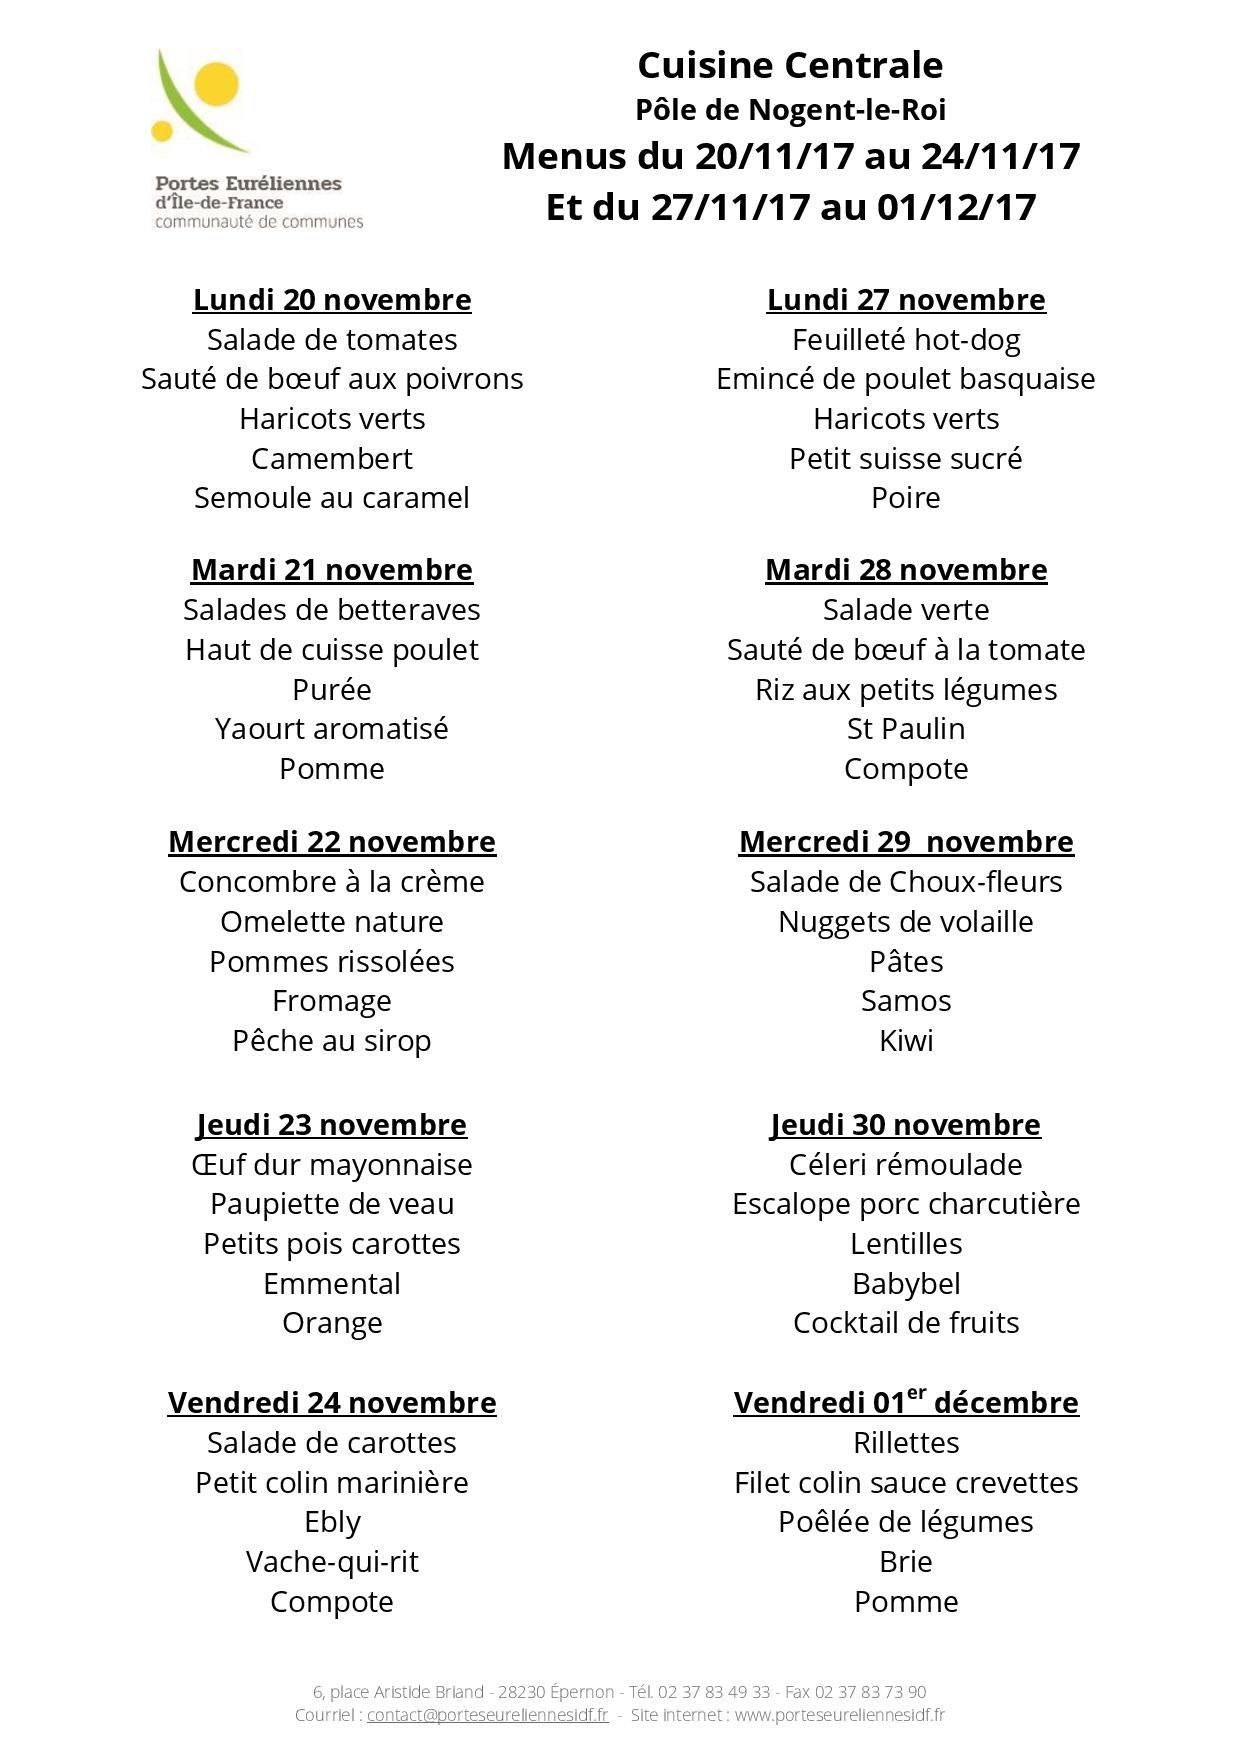 menu-du-20-novembre-au-1er-decembre-2017